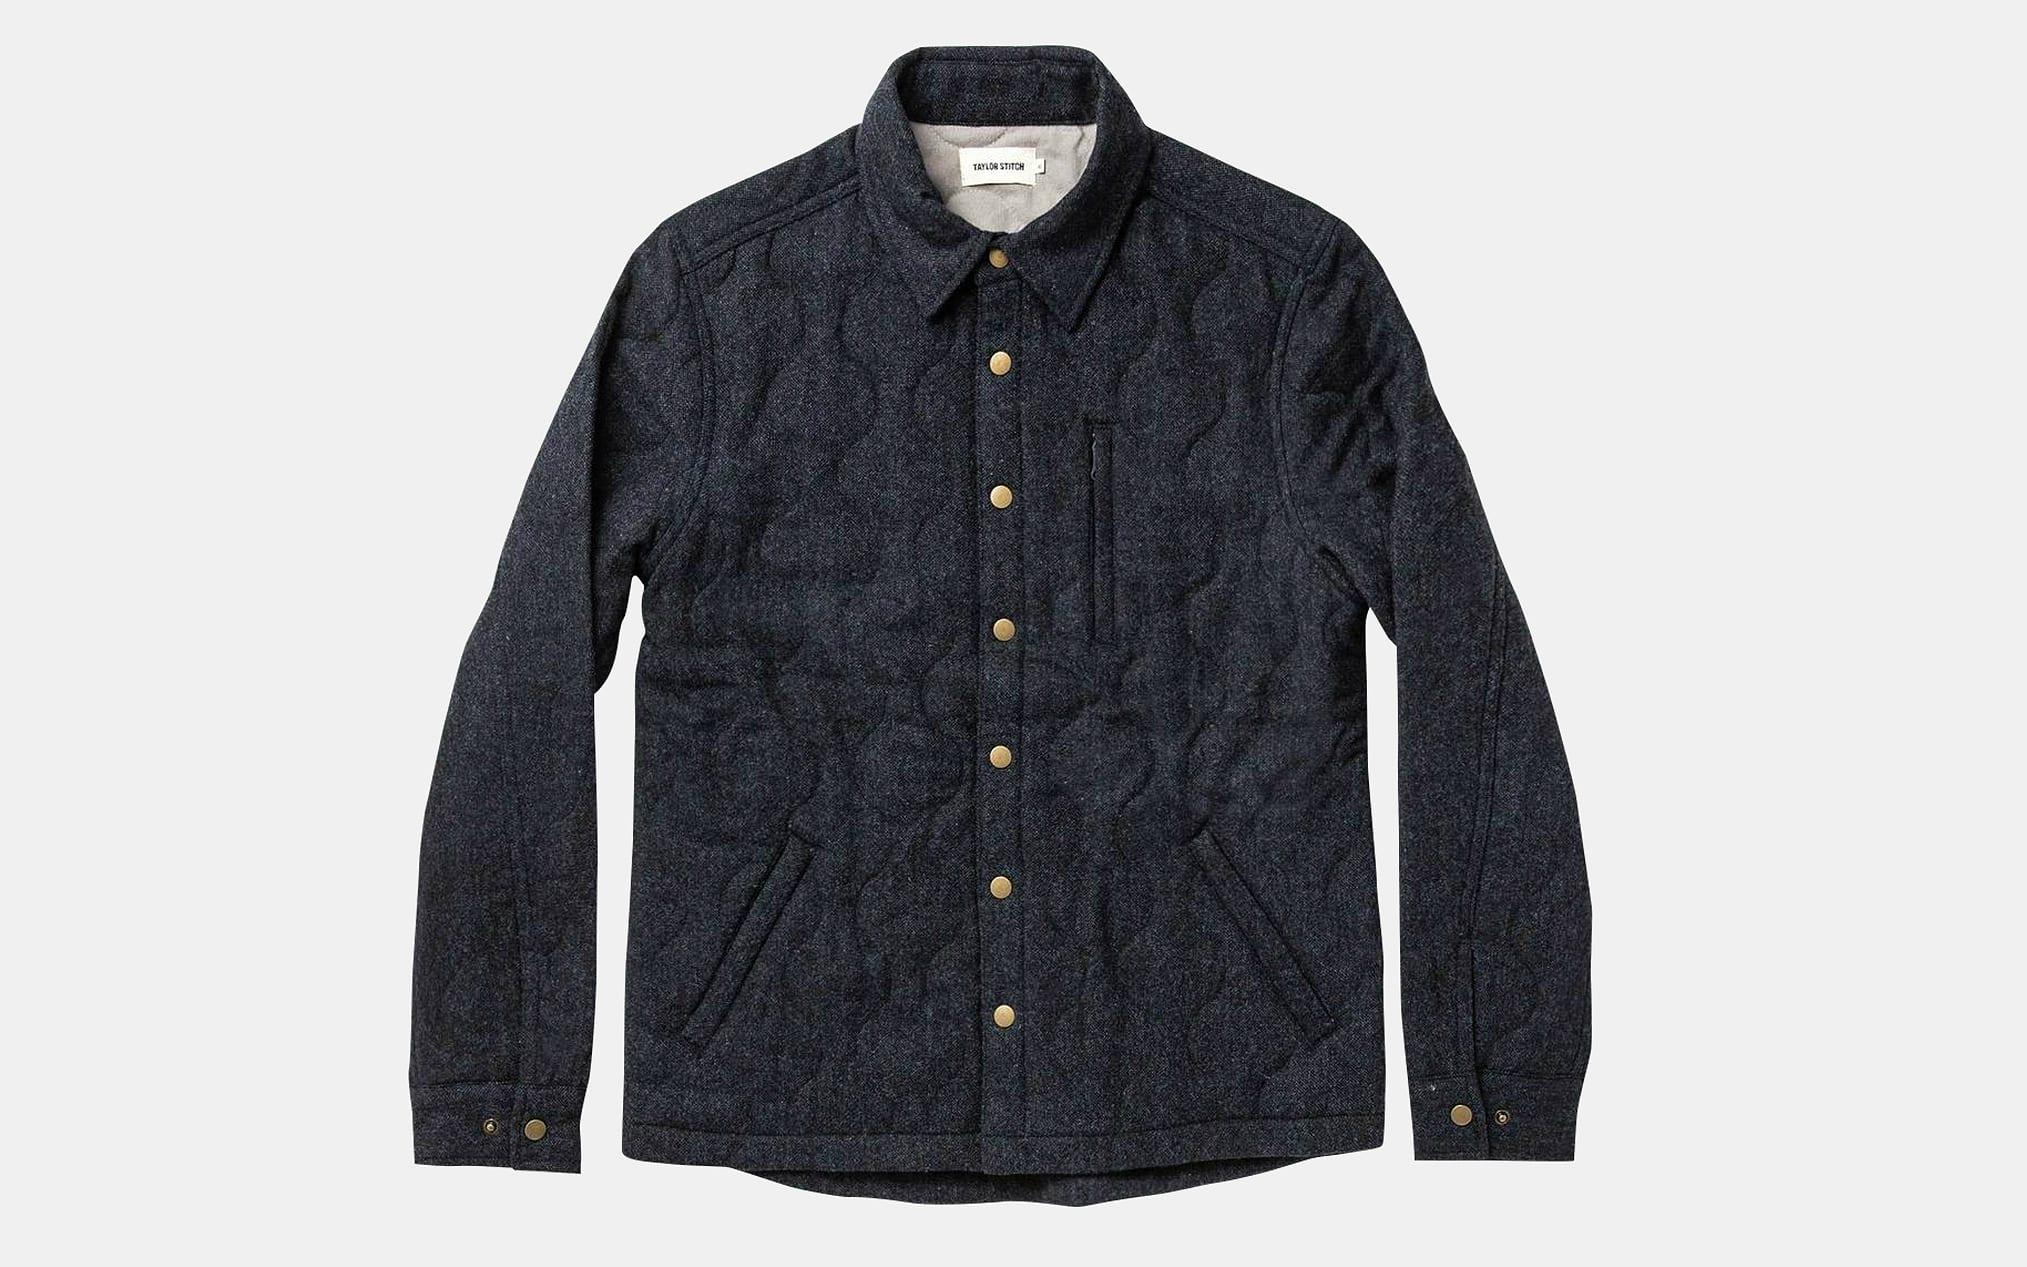 Taylor Stitch Wilton Jacket in Navy Birdseye Wool